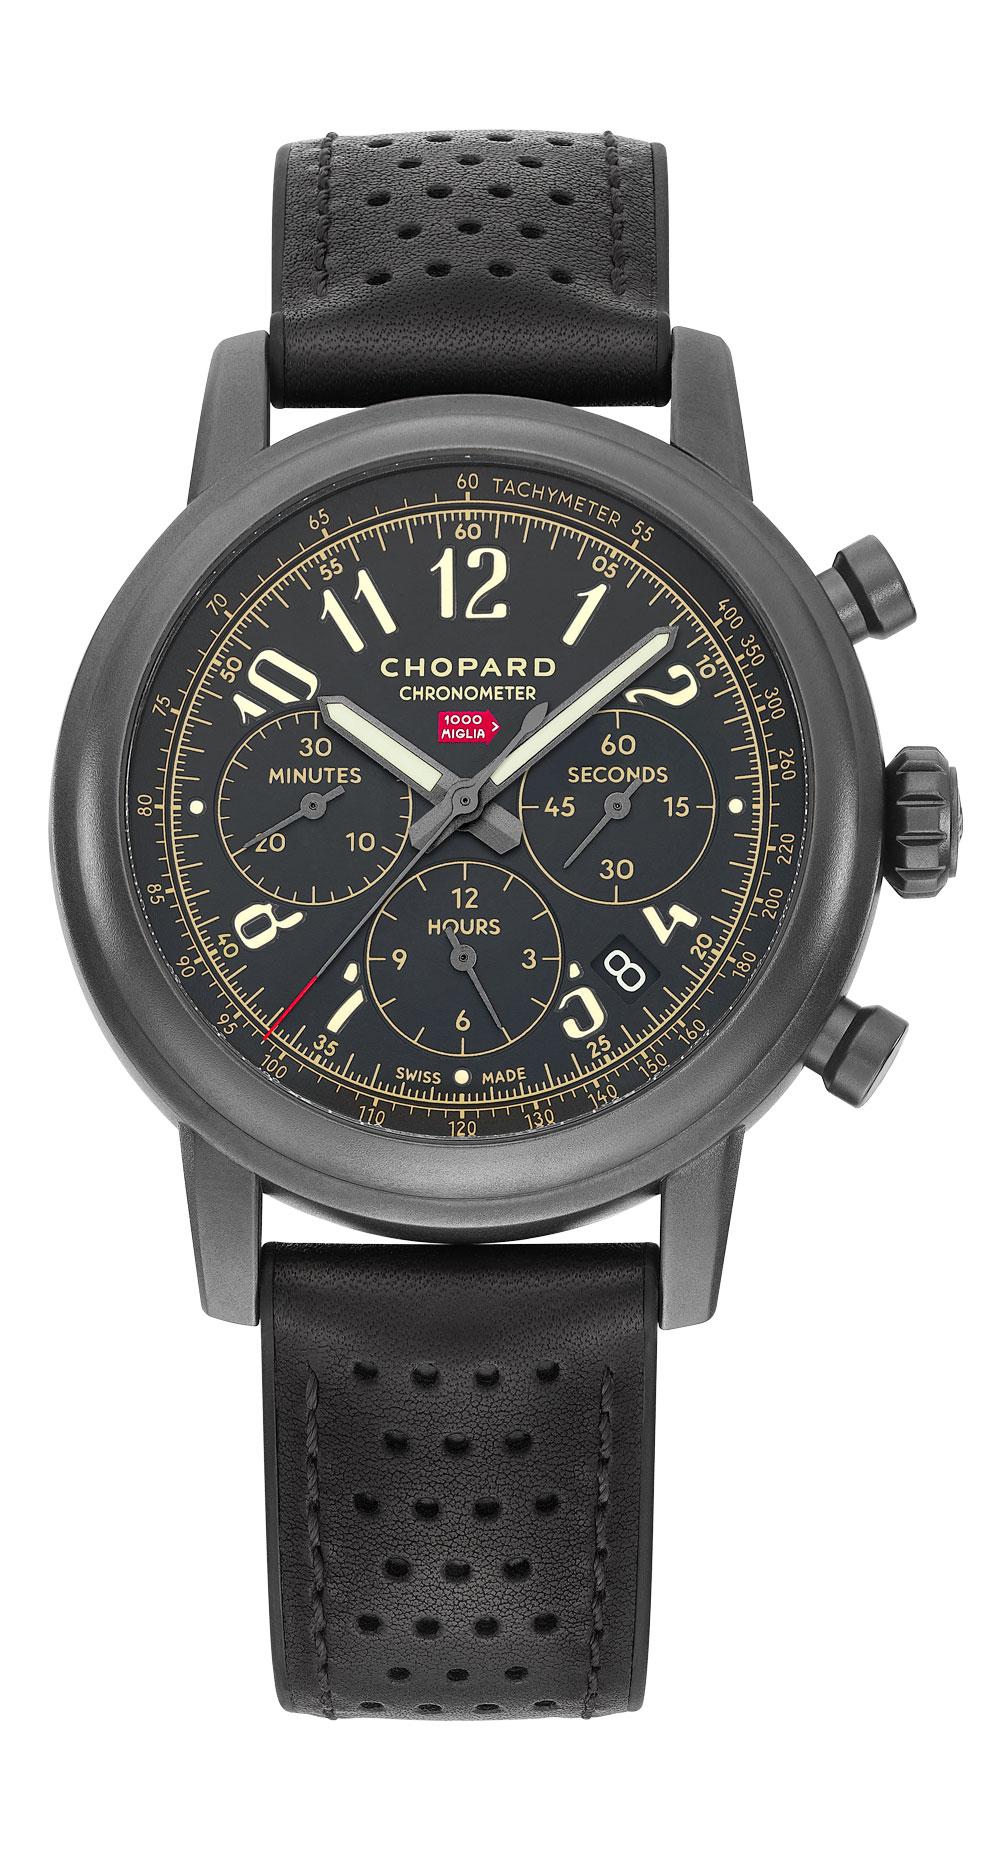 Chopard Mille Miglia 42mm Watch